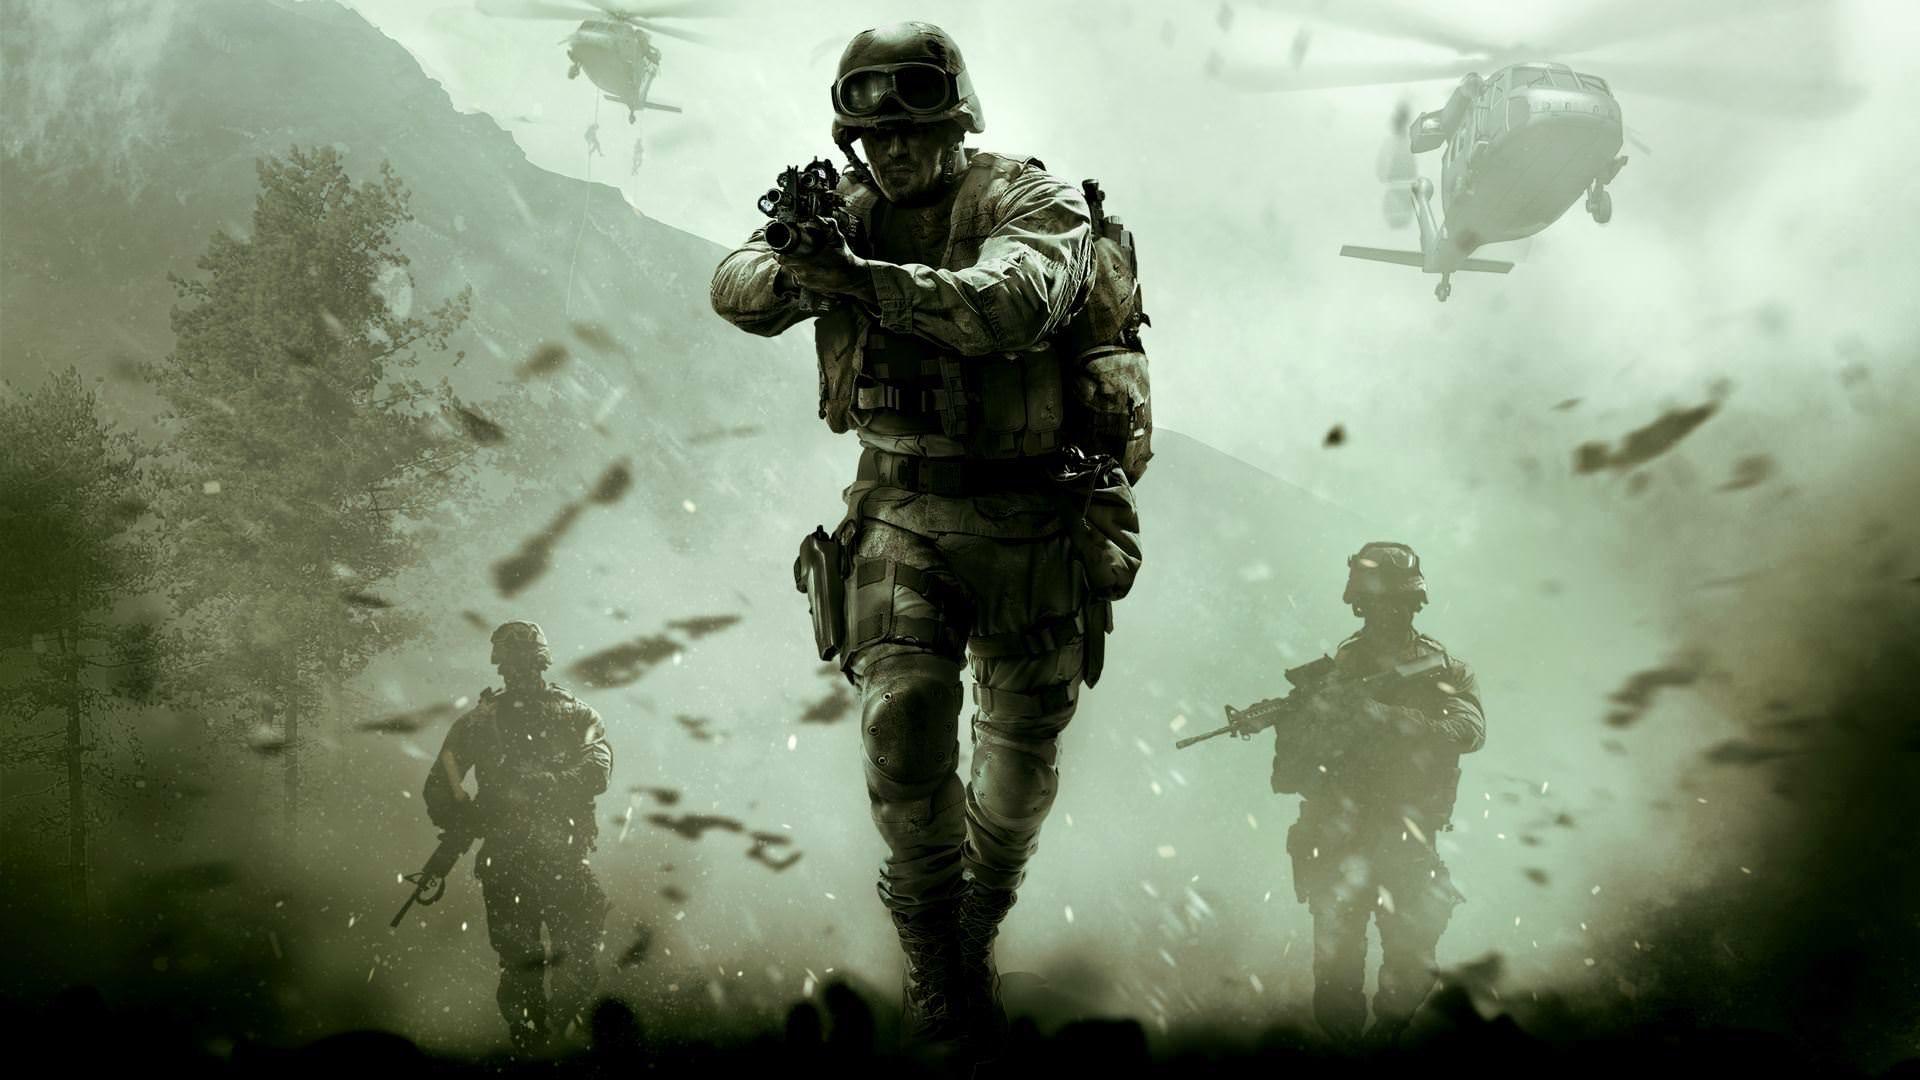 call of duty modern warfare hd desktop wallpaper widescreen | hd